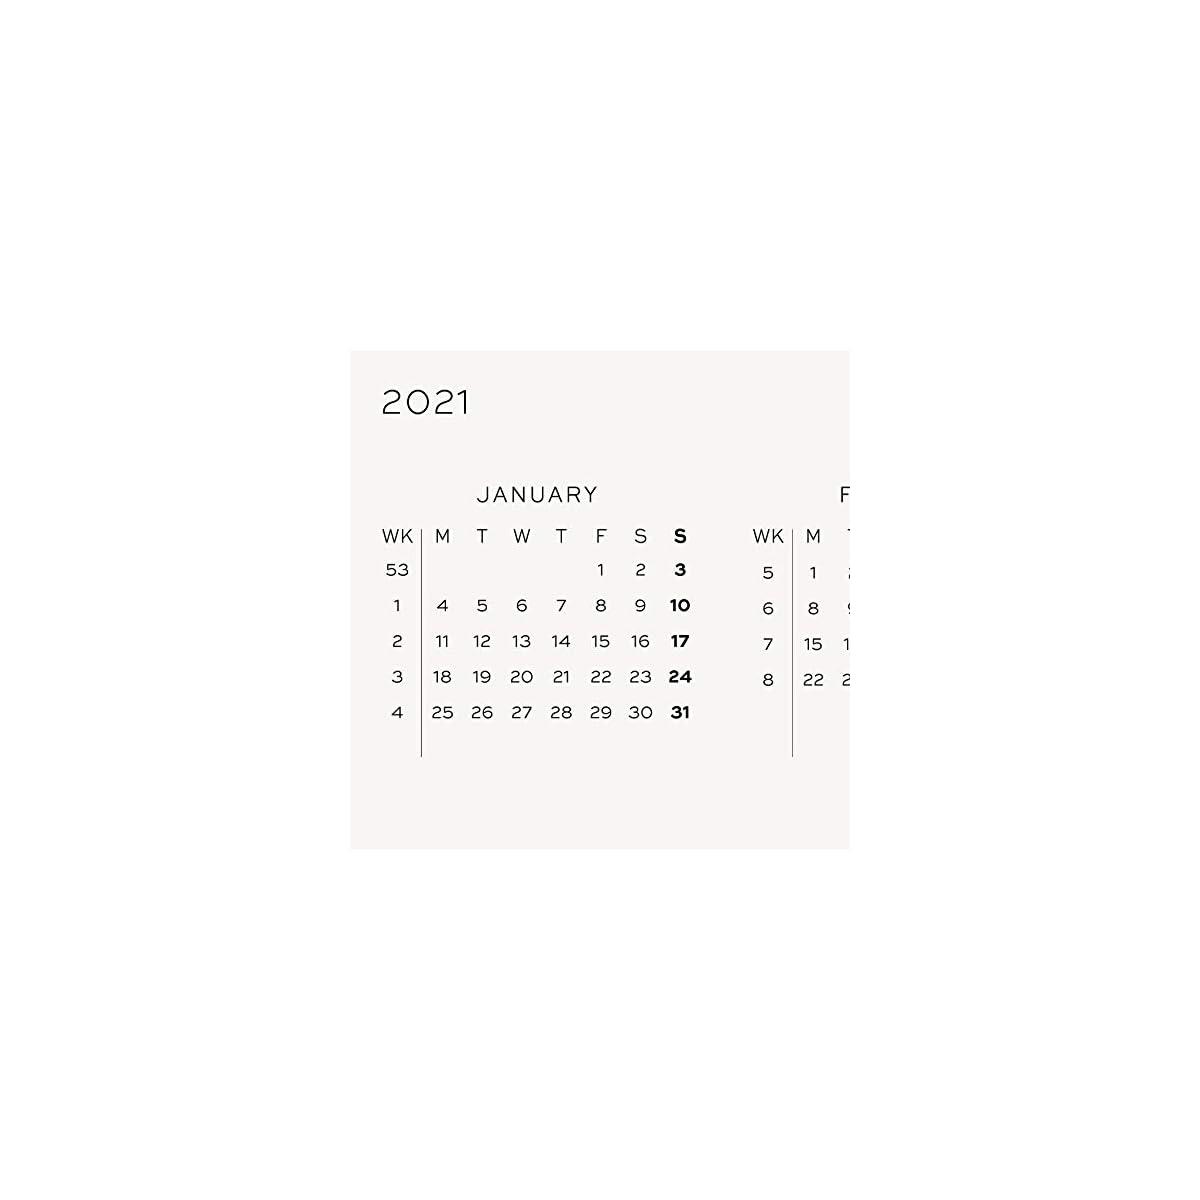 Agenda 2021 formato A4 blu navy 2 pagine Imprint Press